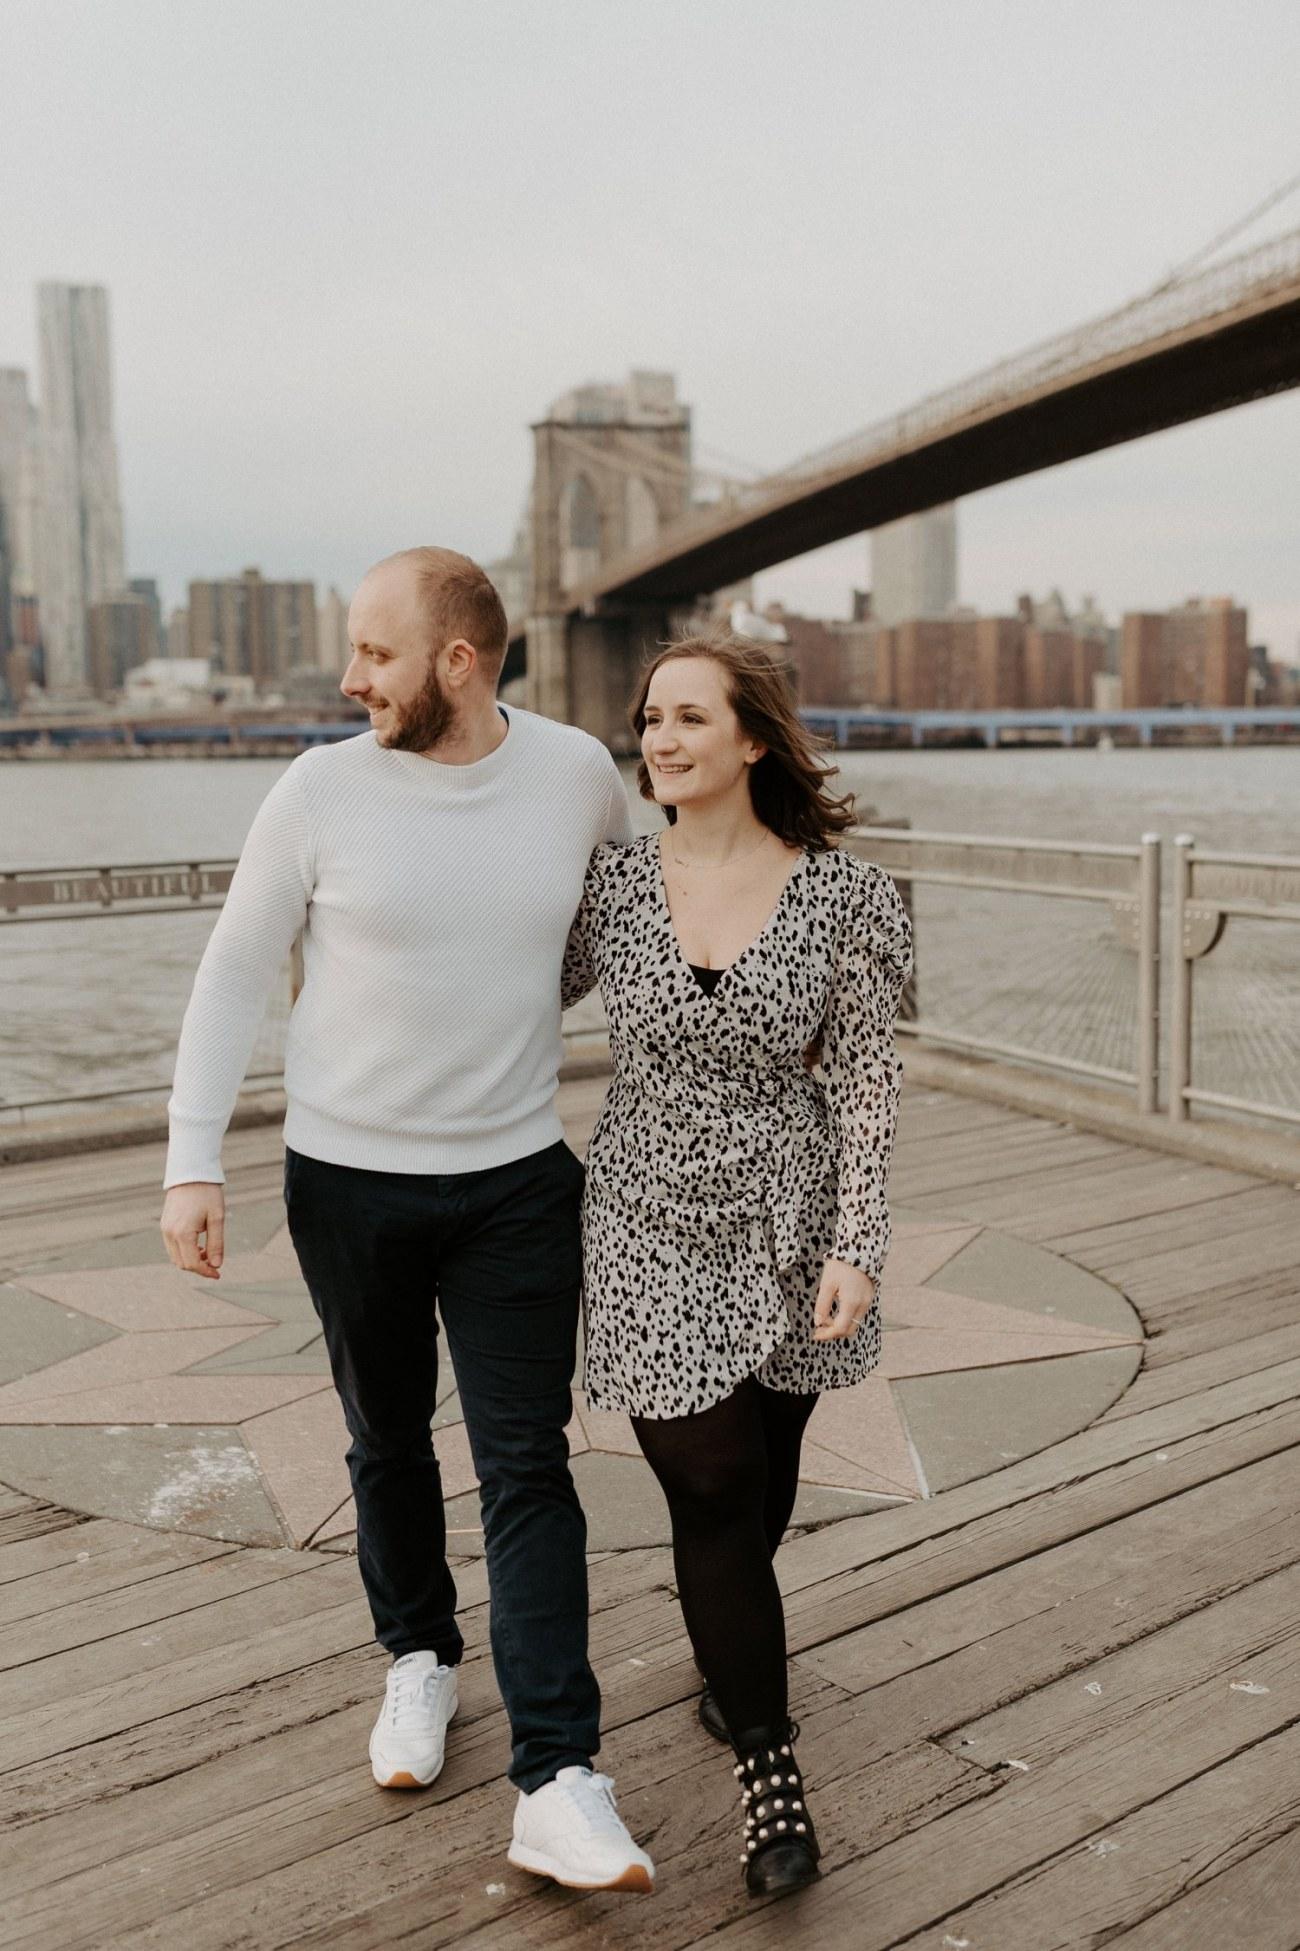 Brooklyn Bridge Engagement Photos Brooklyn Dumbo Couple Session NYC Wedding Photographer Anais Possamai Photography 06